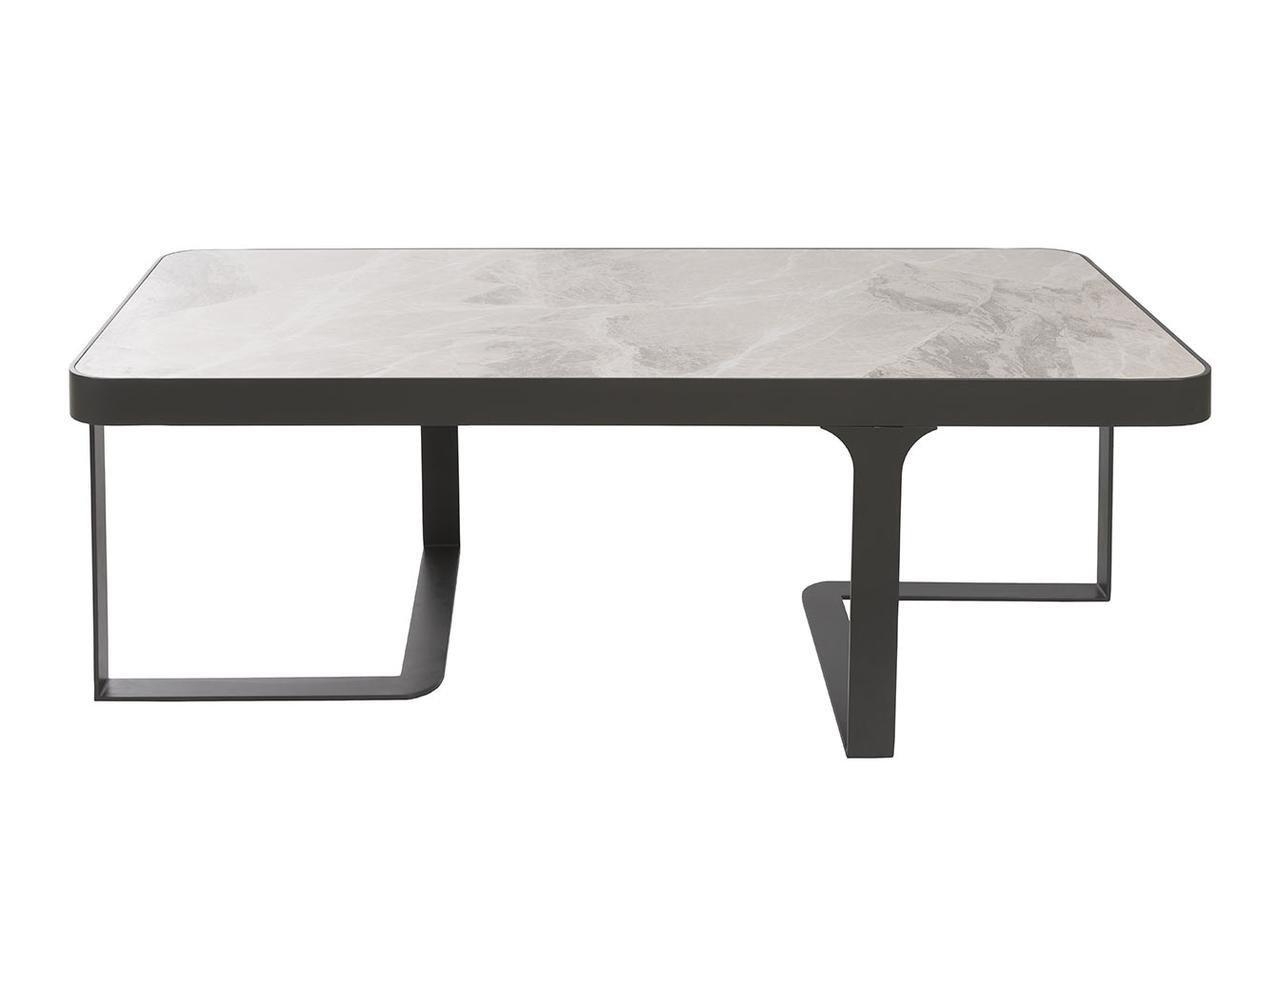 Журнальный столик Nicolas SHEFFIELD 121х61х41 см керамика светло-серый глянец